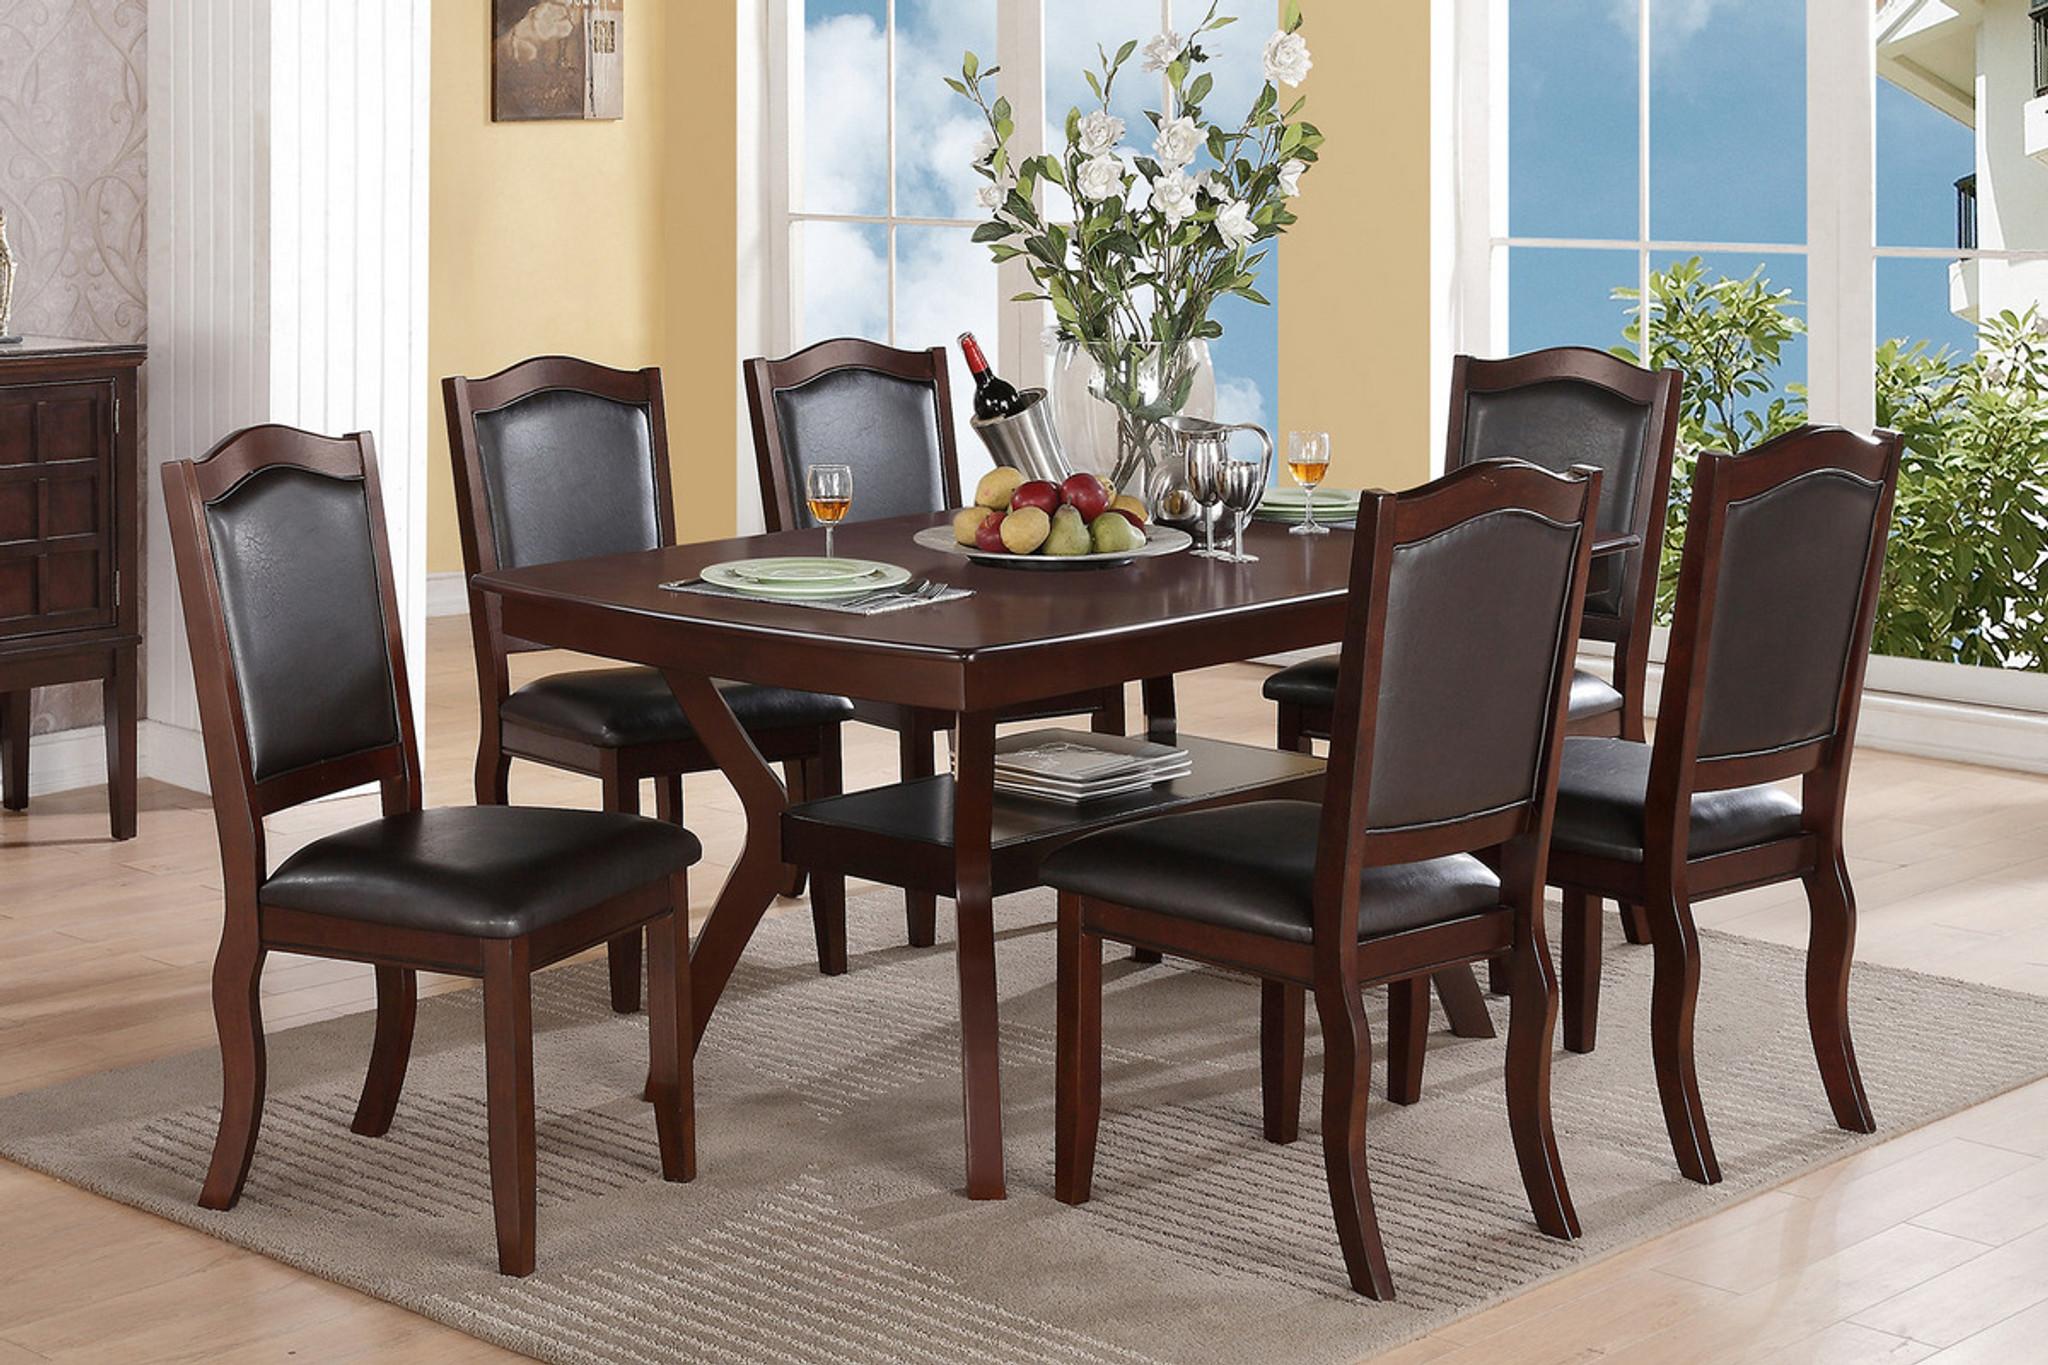 Incredible Rectangular Shaped Dark Brown Wood Veneer 7 Pcs Dining Room Set Download Free Architecture Designs Sospemadebymaigaardcom